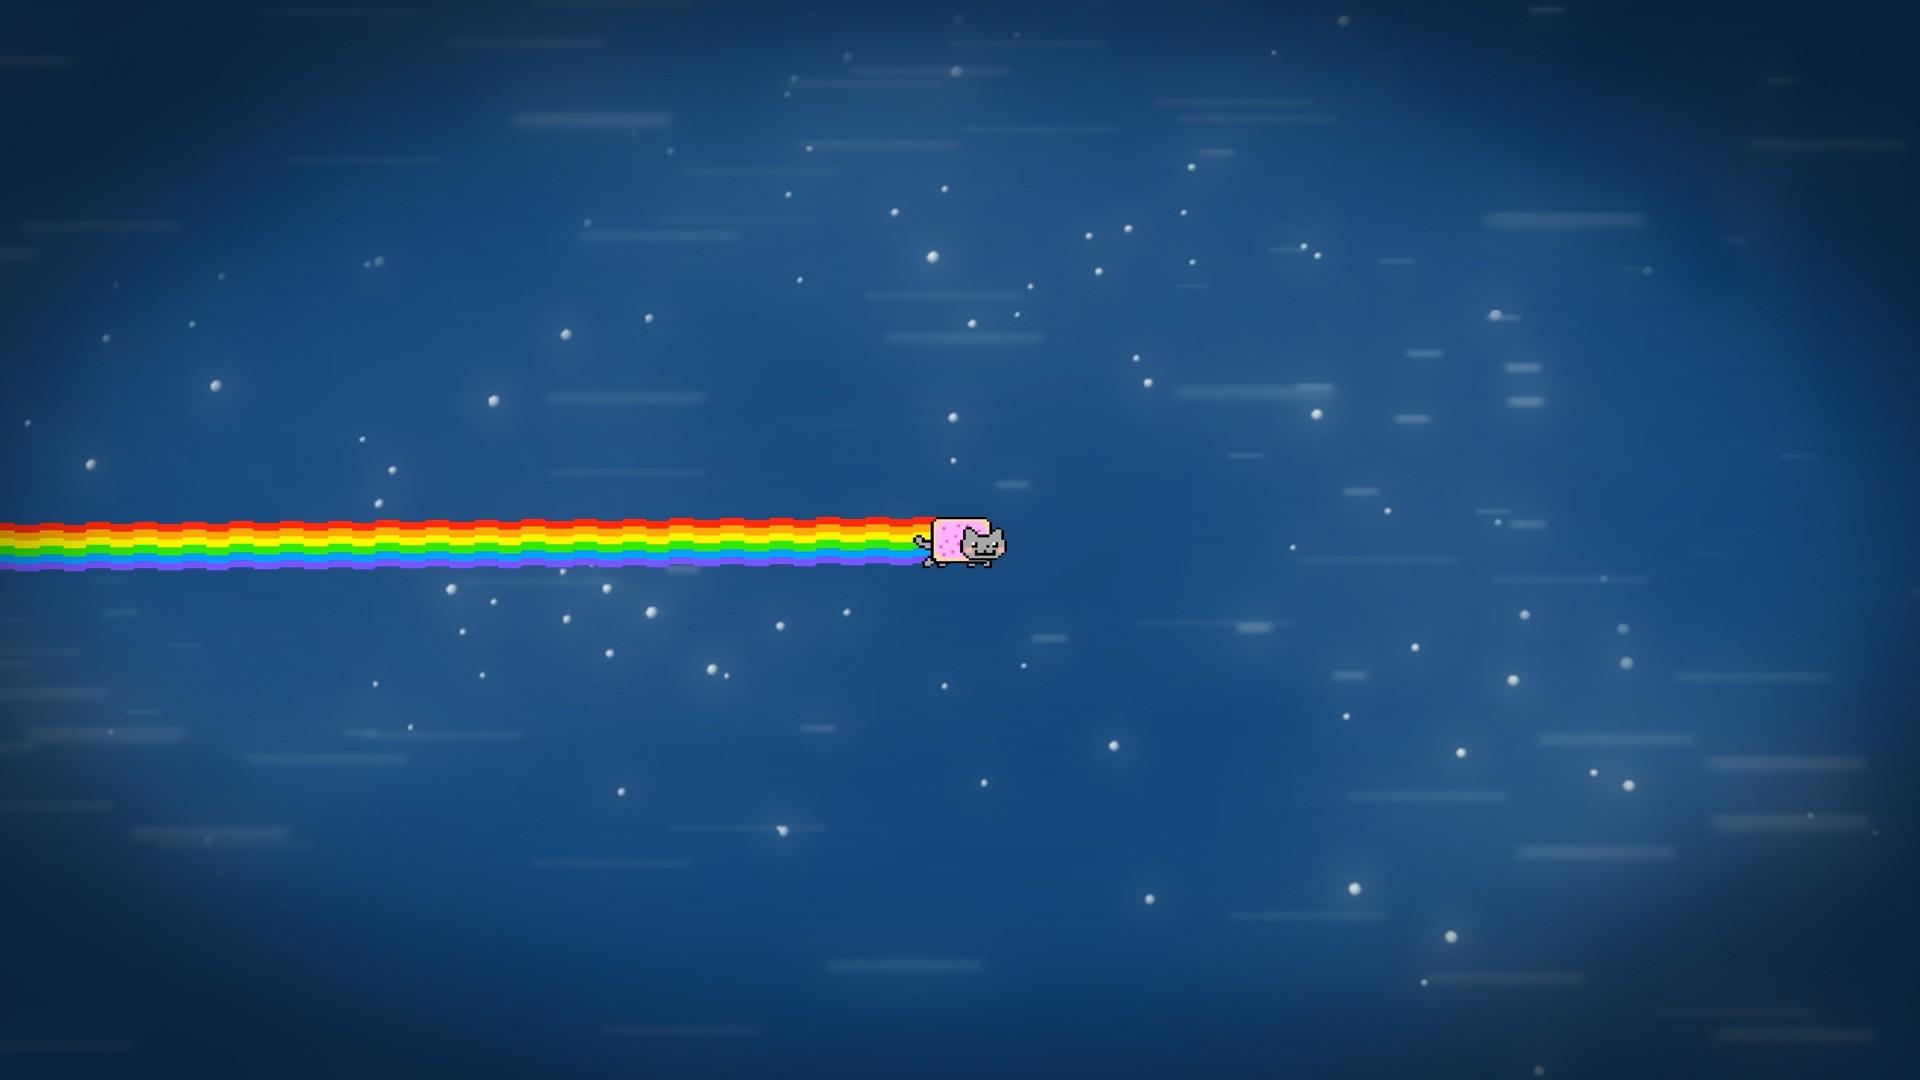 Wiki Nyan Cat Desktop Backgrounds Pic Wpe004399   Data - Electric Blue - HD Wallpaper